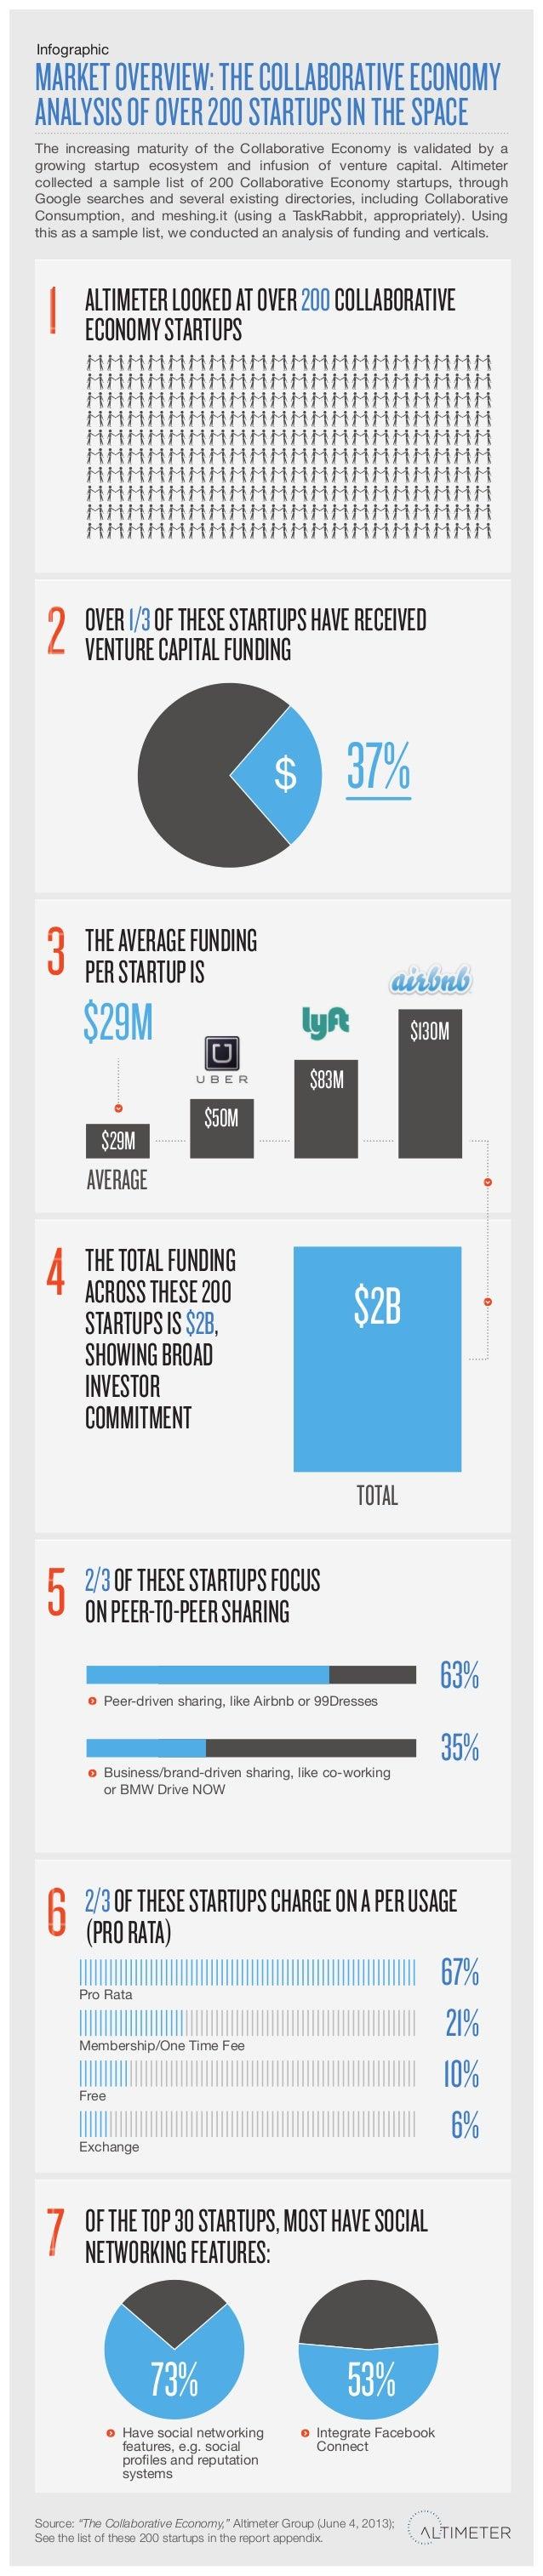 [Graphic] Market Overview: The Collaborative Economy